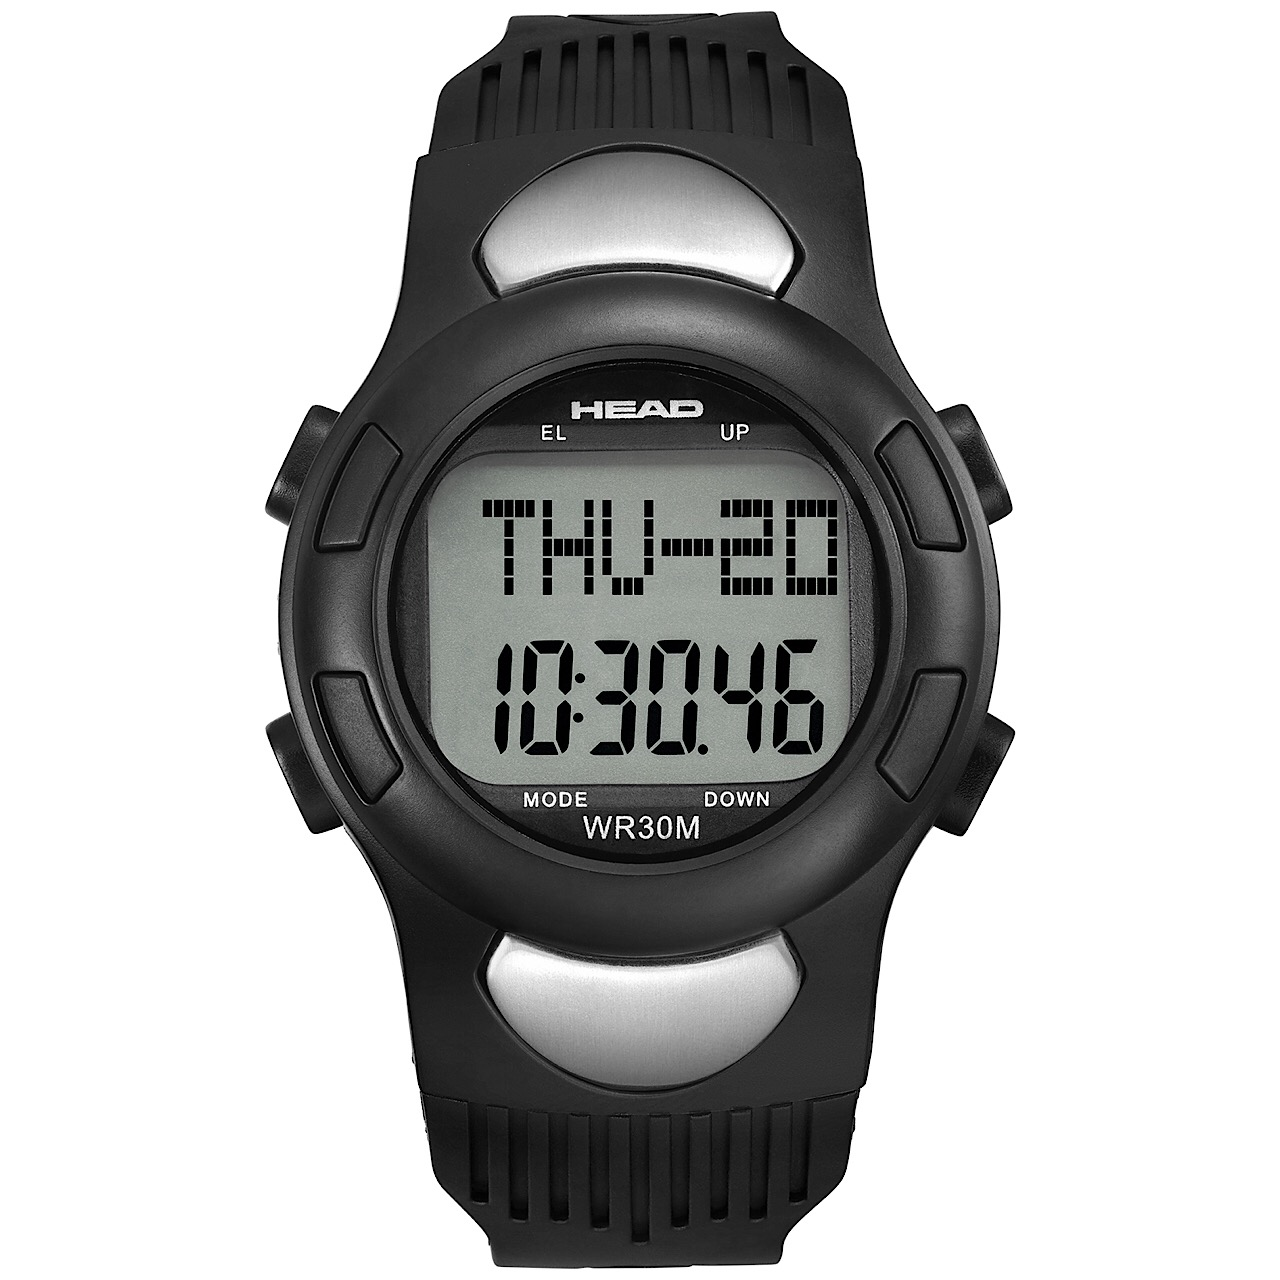 ساعت مچی دیجیتالی هد مدل Tie Break HE-101-01